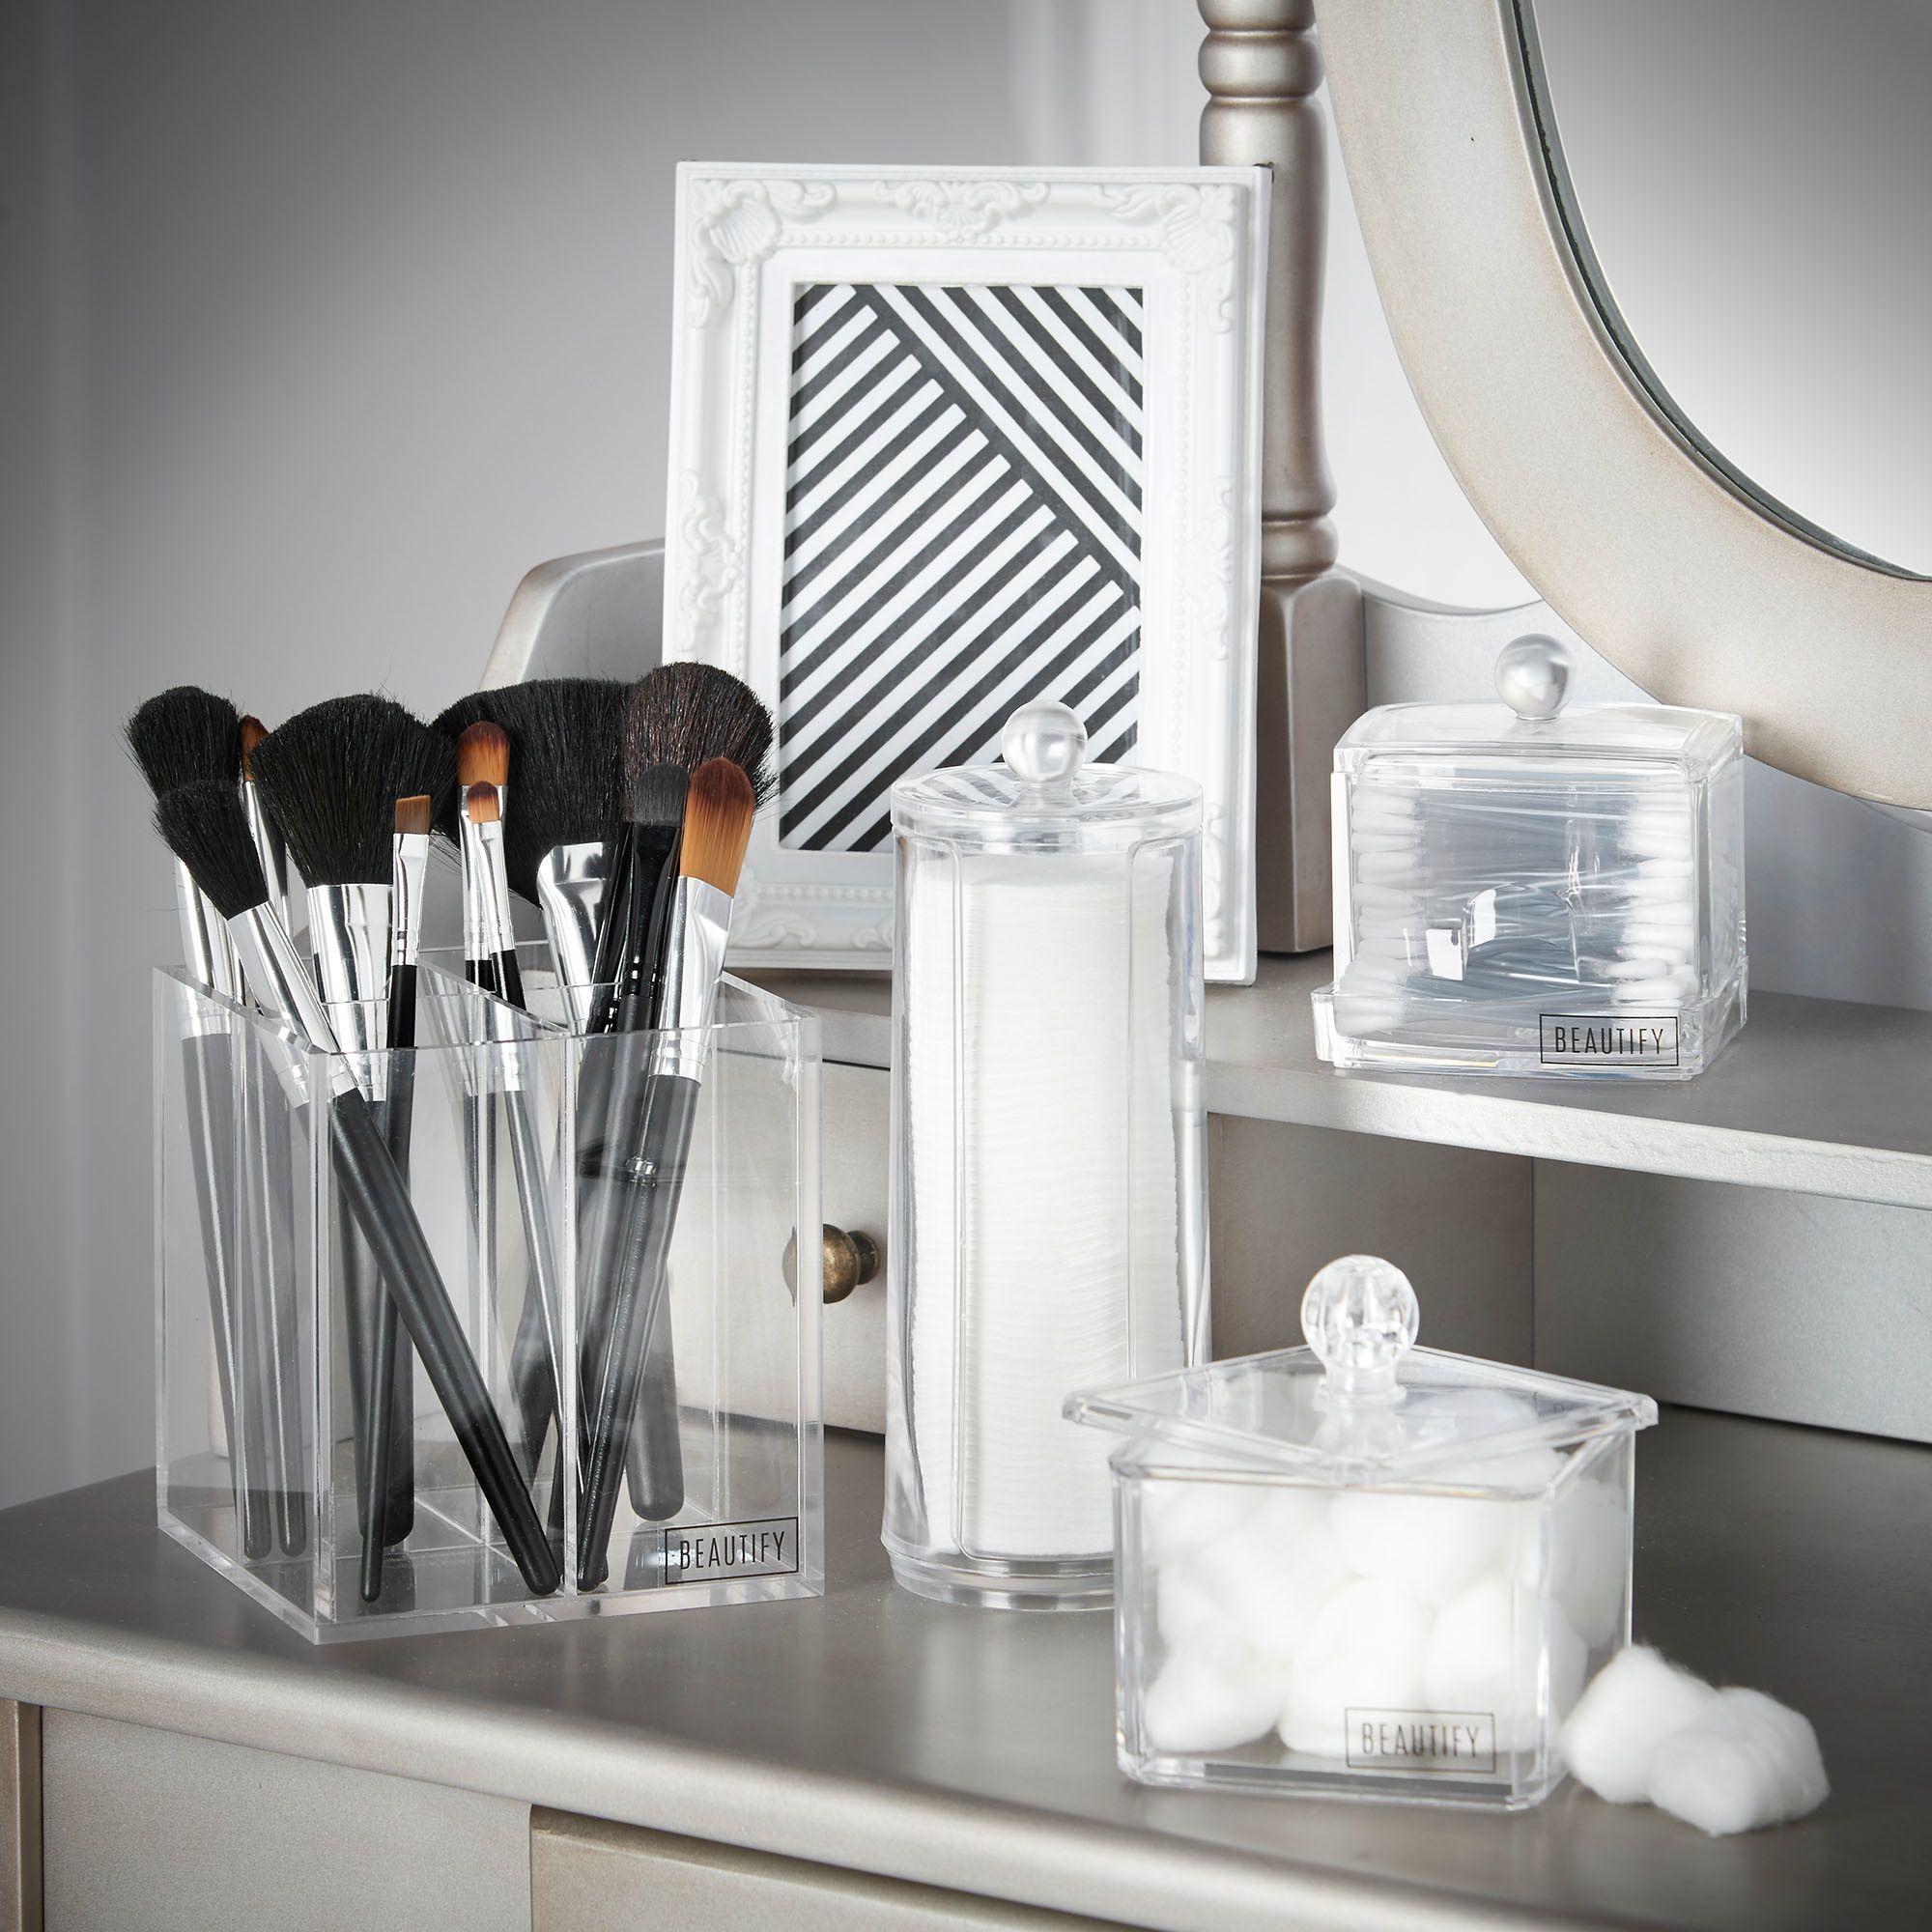 Lipstick bathroom set - 4 Piece Bathroom Storage Organizer Set